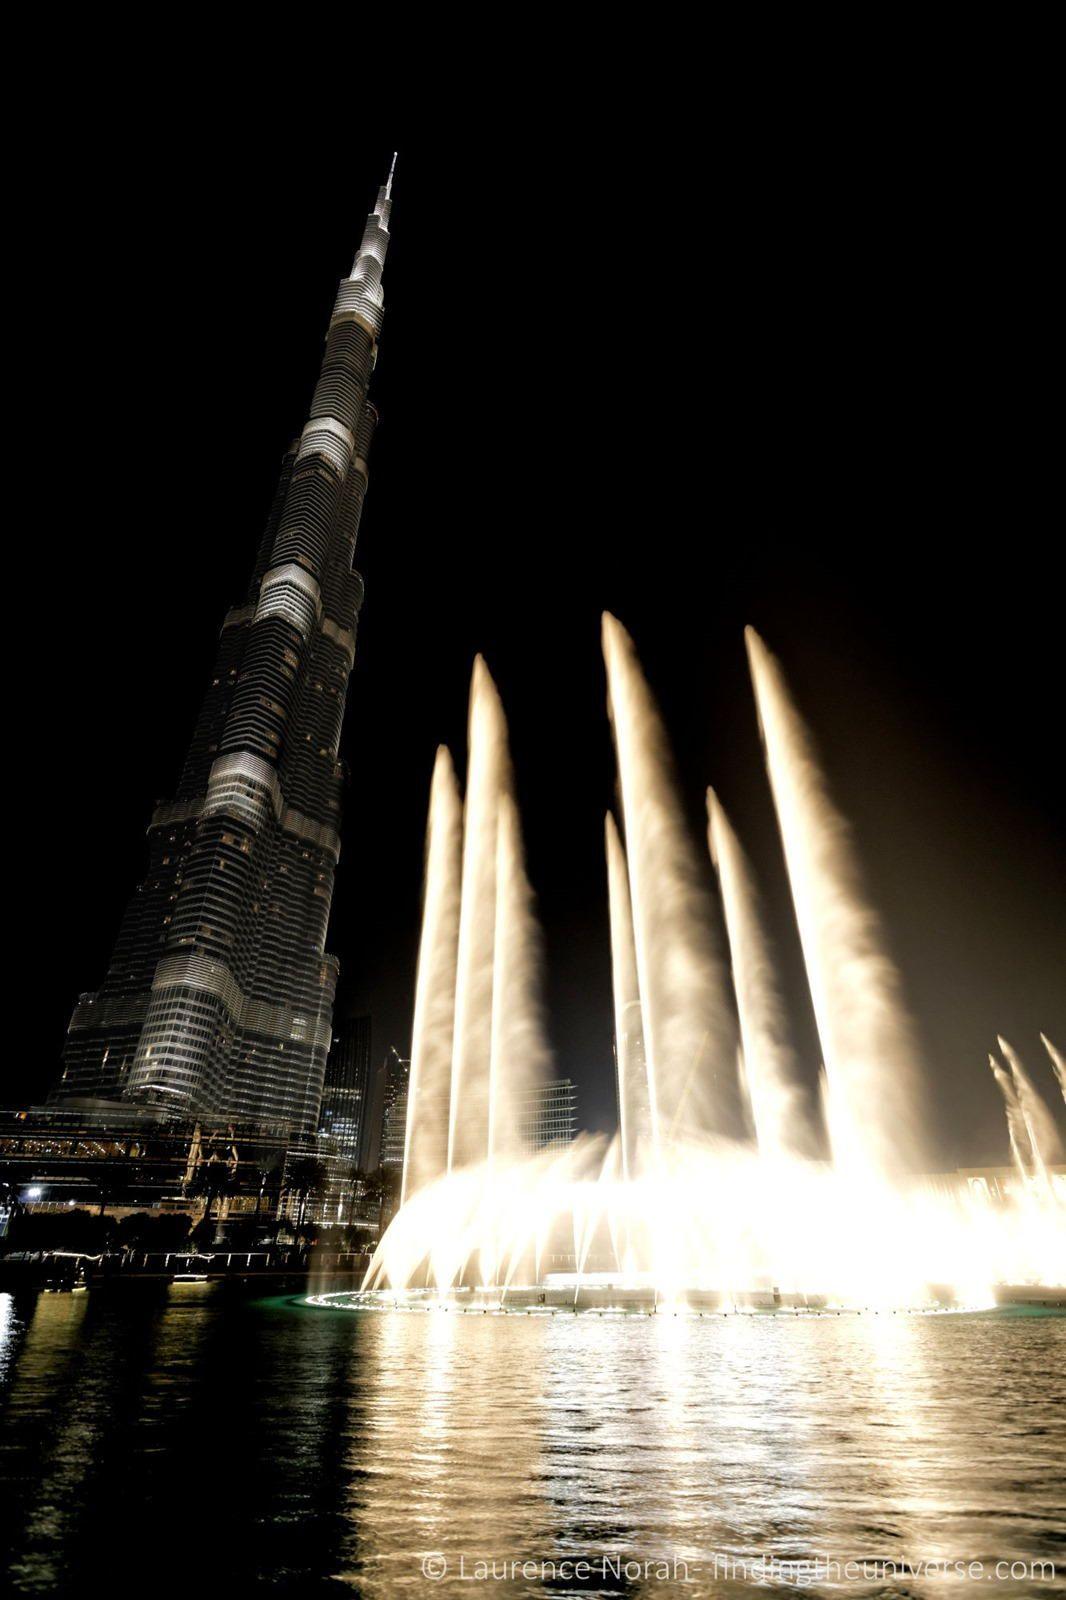 Burj Khalifa, the world's tallest man made structure (830m) in Dubai